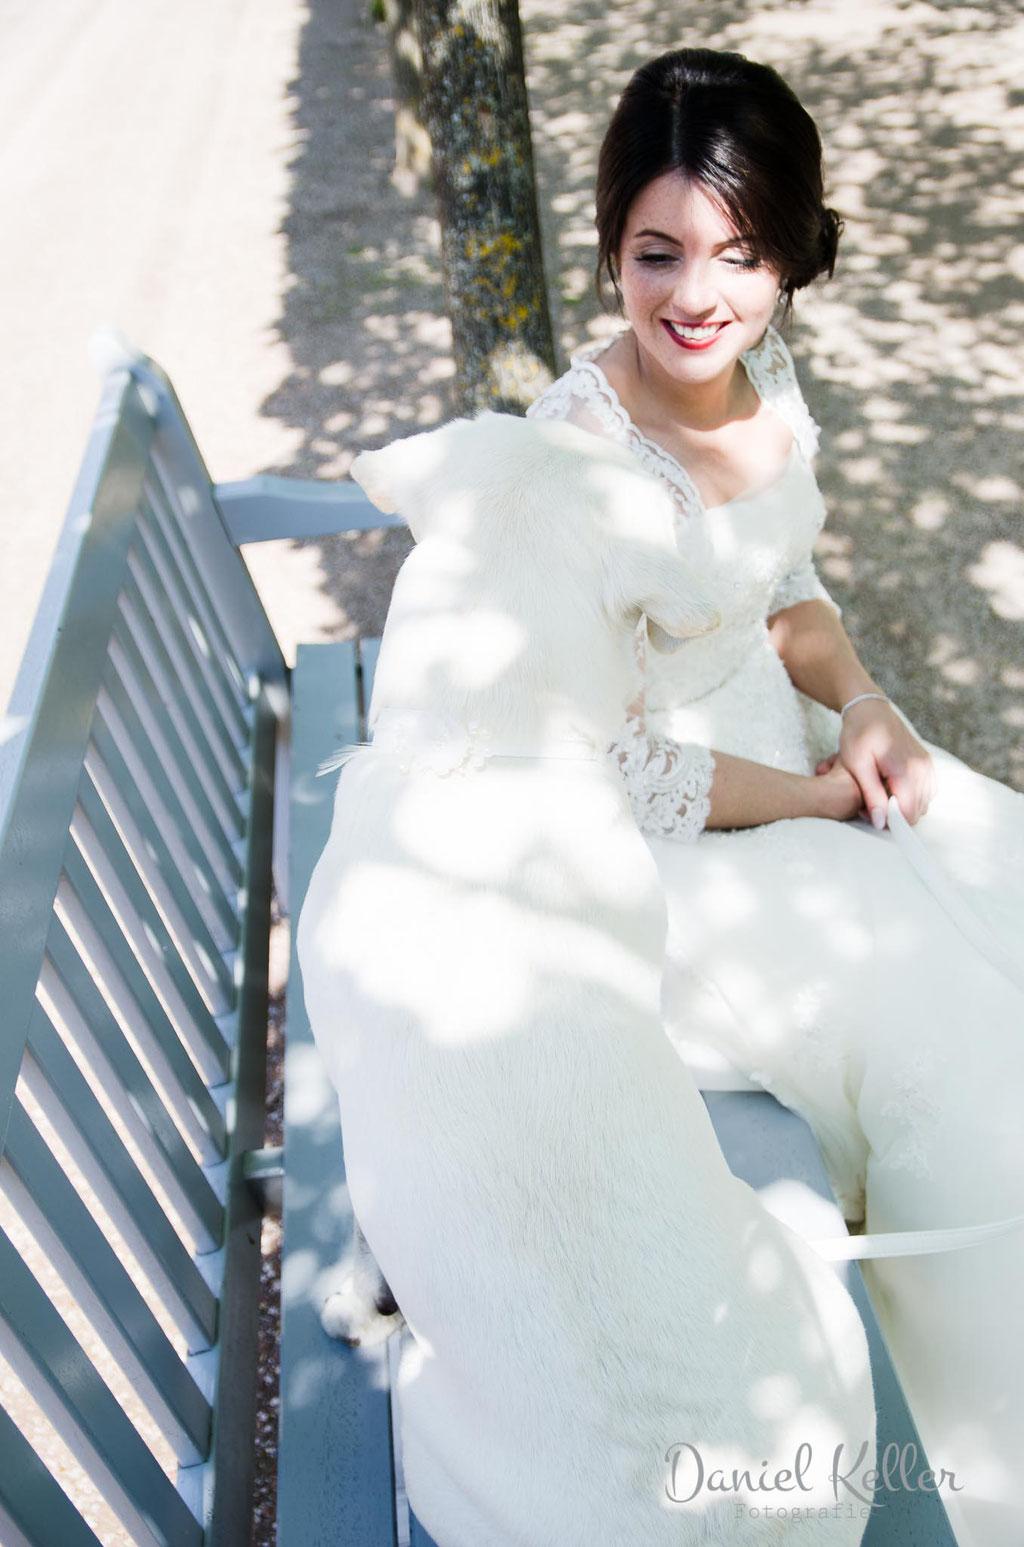 Braut mit Hund / Schloss Favorit Rastatt / Daniel Keller Hochzeitsfotograf